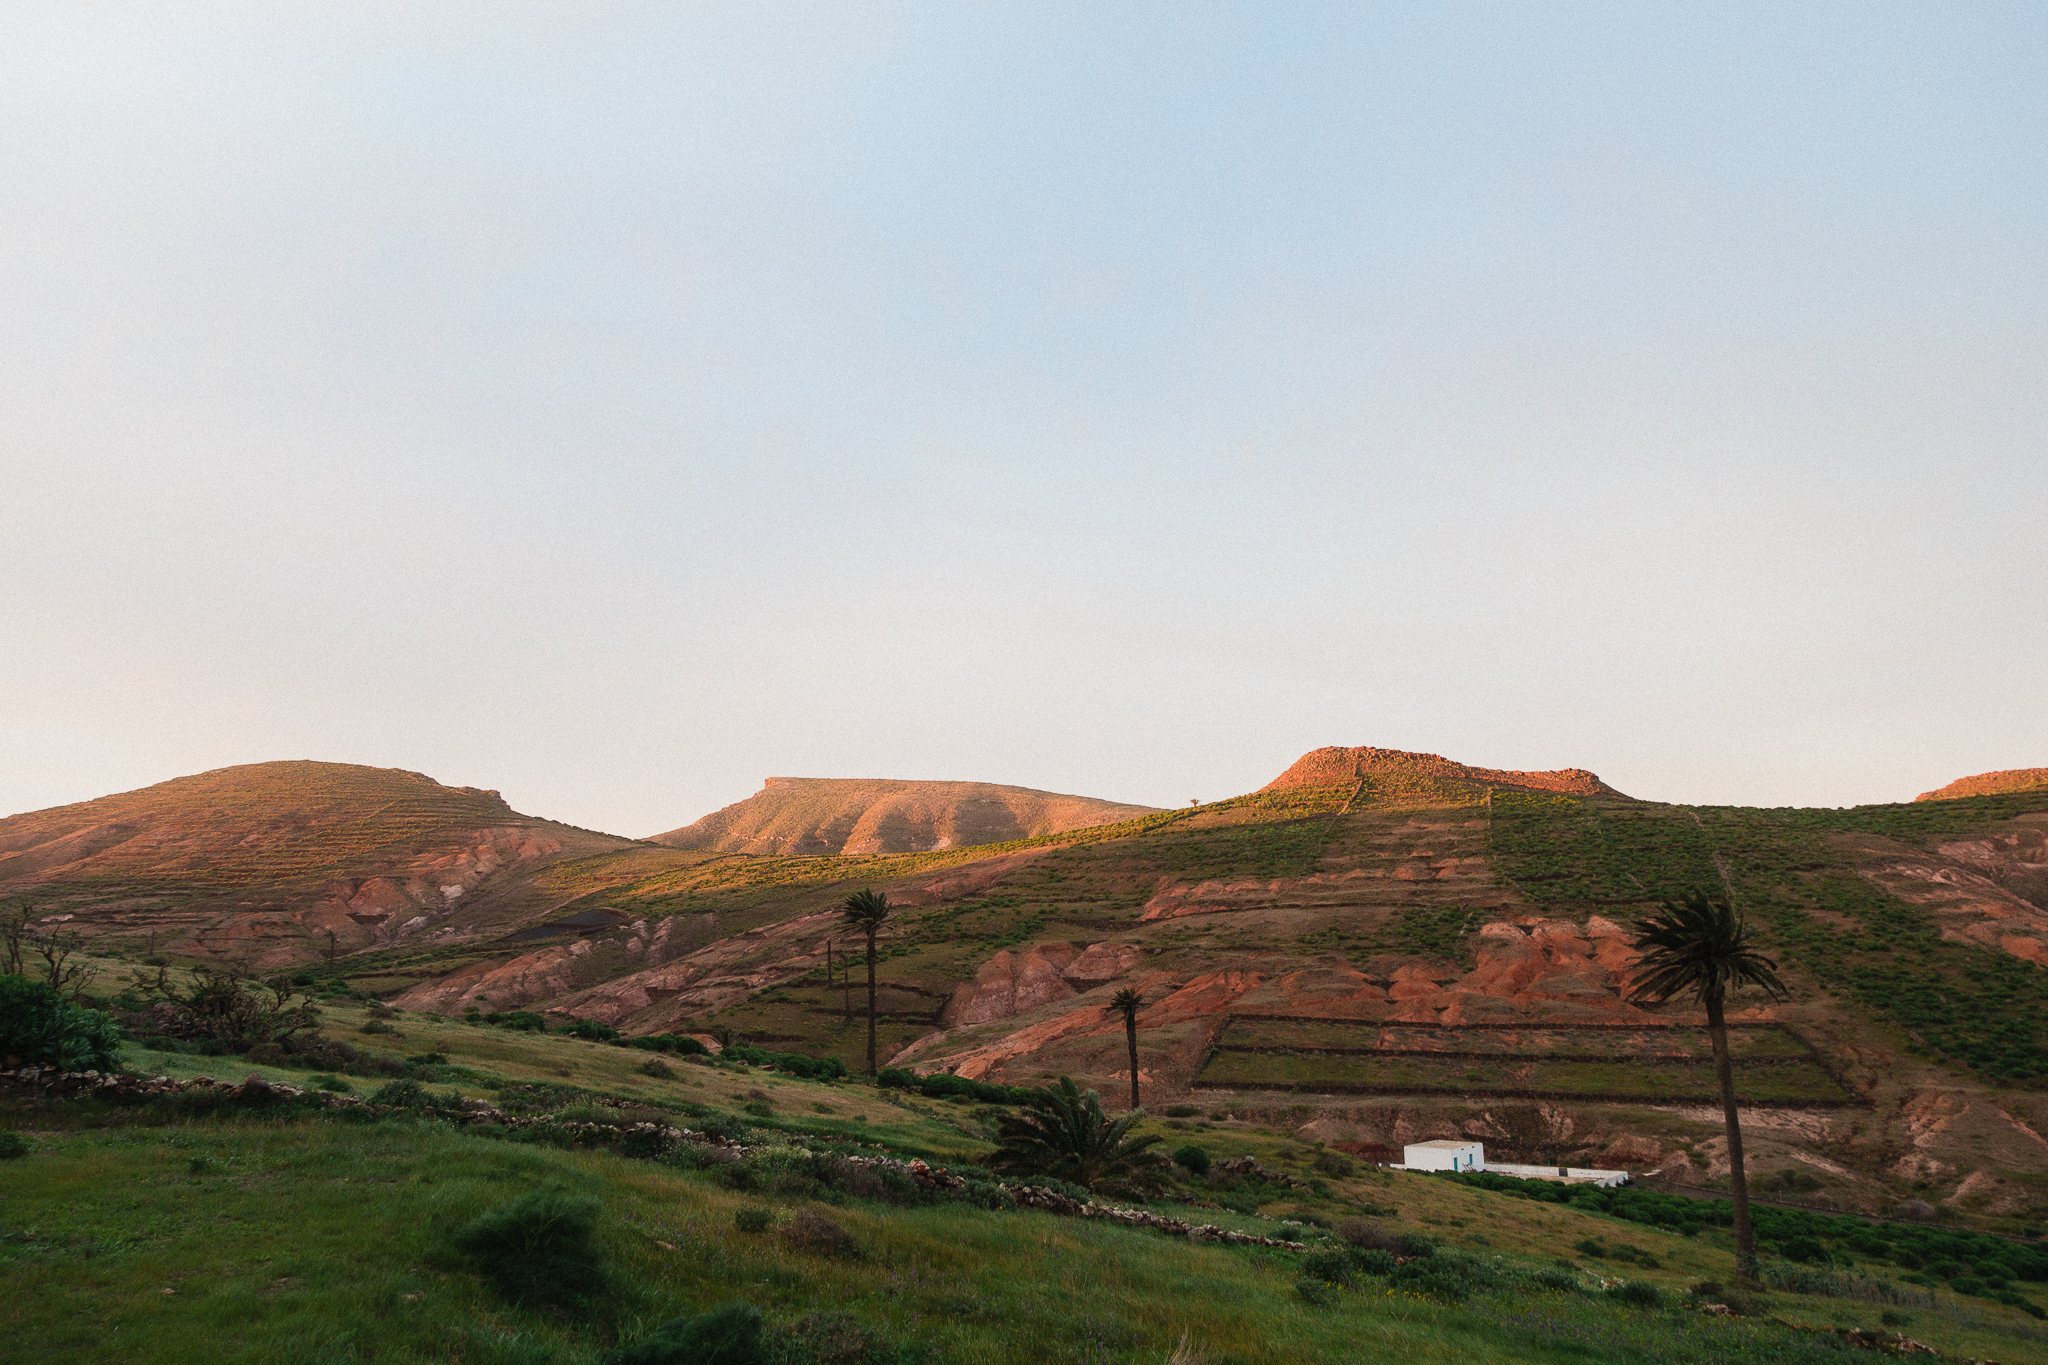 Lanzarote - 10 jours aux Canaries - Haria - Randonnée